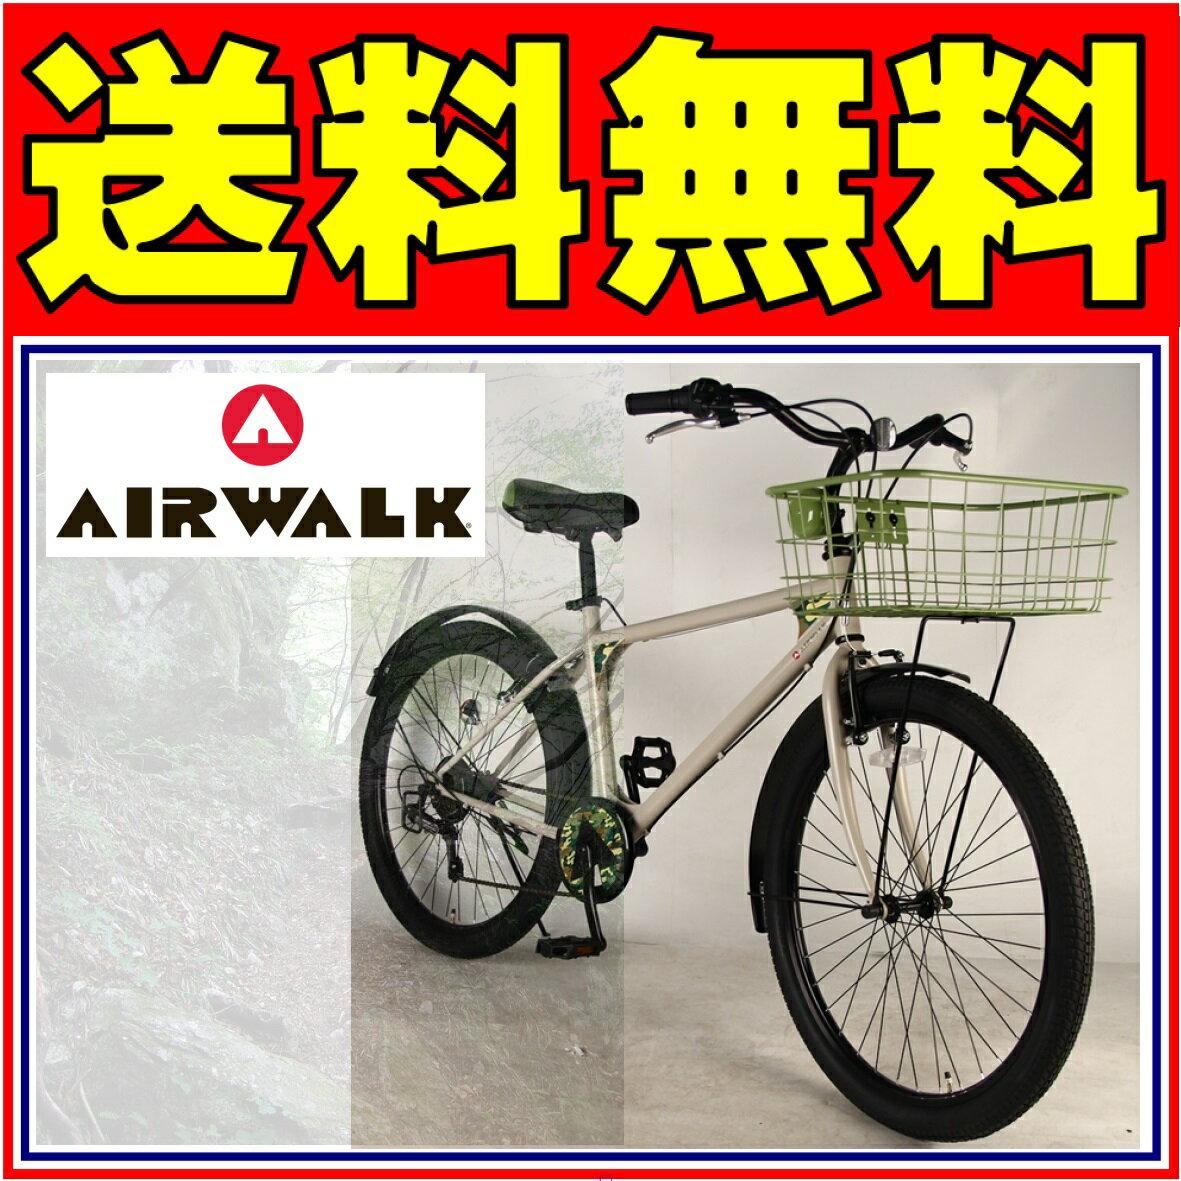 AIRWALK 自転車 ファットバイク(カフェ/アイボリー)<街乗りに最適>MTB/BMX 自転車 26インチ 外装6段 送料無料 AIRWALK エアーウォーク 自転車 ファットバイク 街乗りでカッコよくキマるファットバイク!乗り降りしやすいフレーム形状です。男子に人気のカラーリングで、プレゼントに最適★